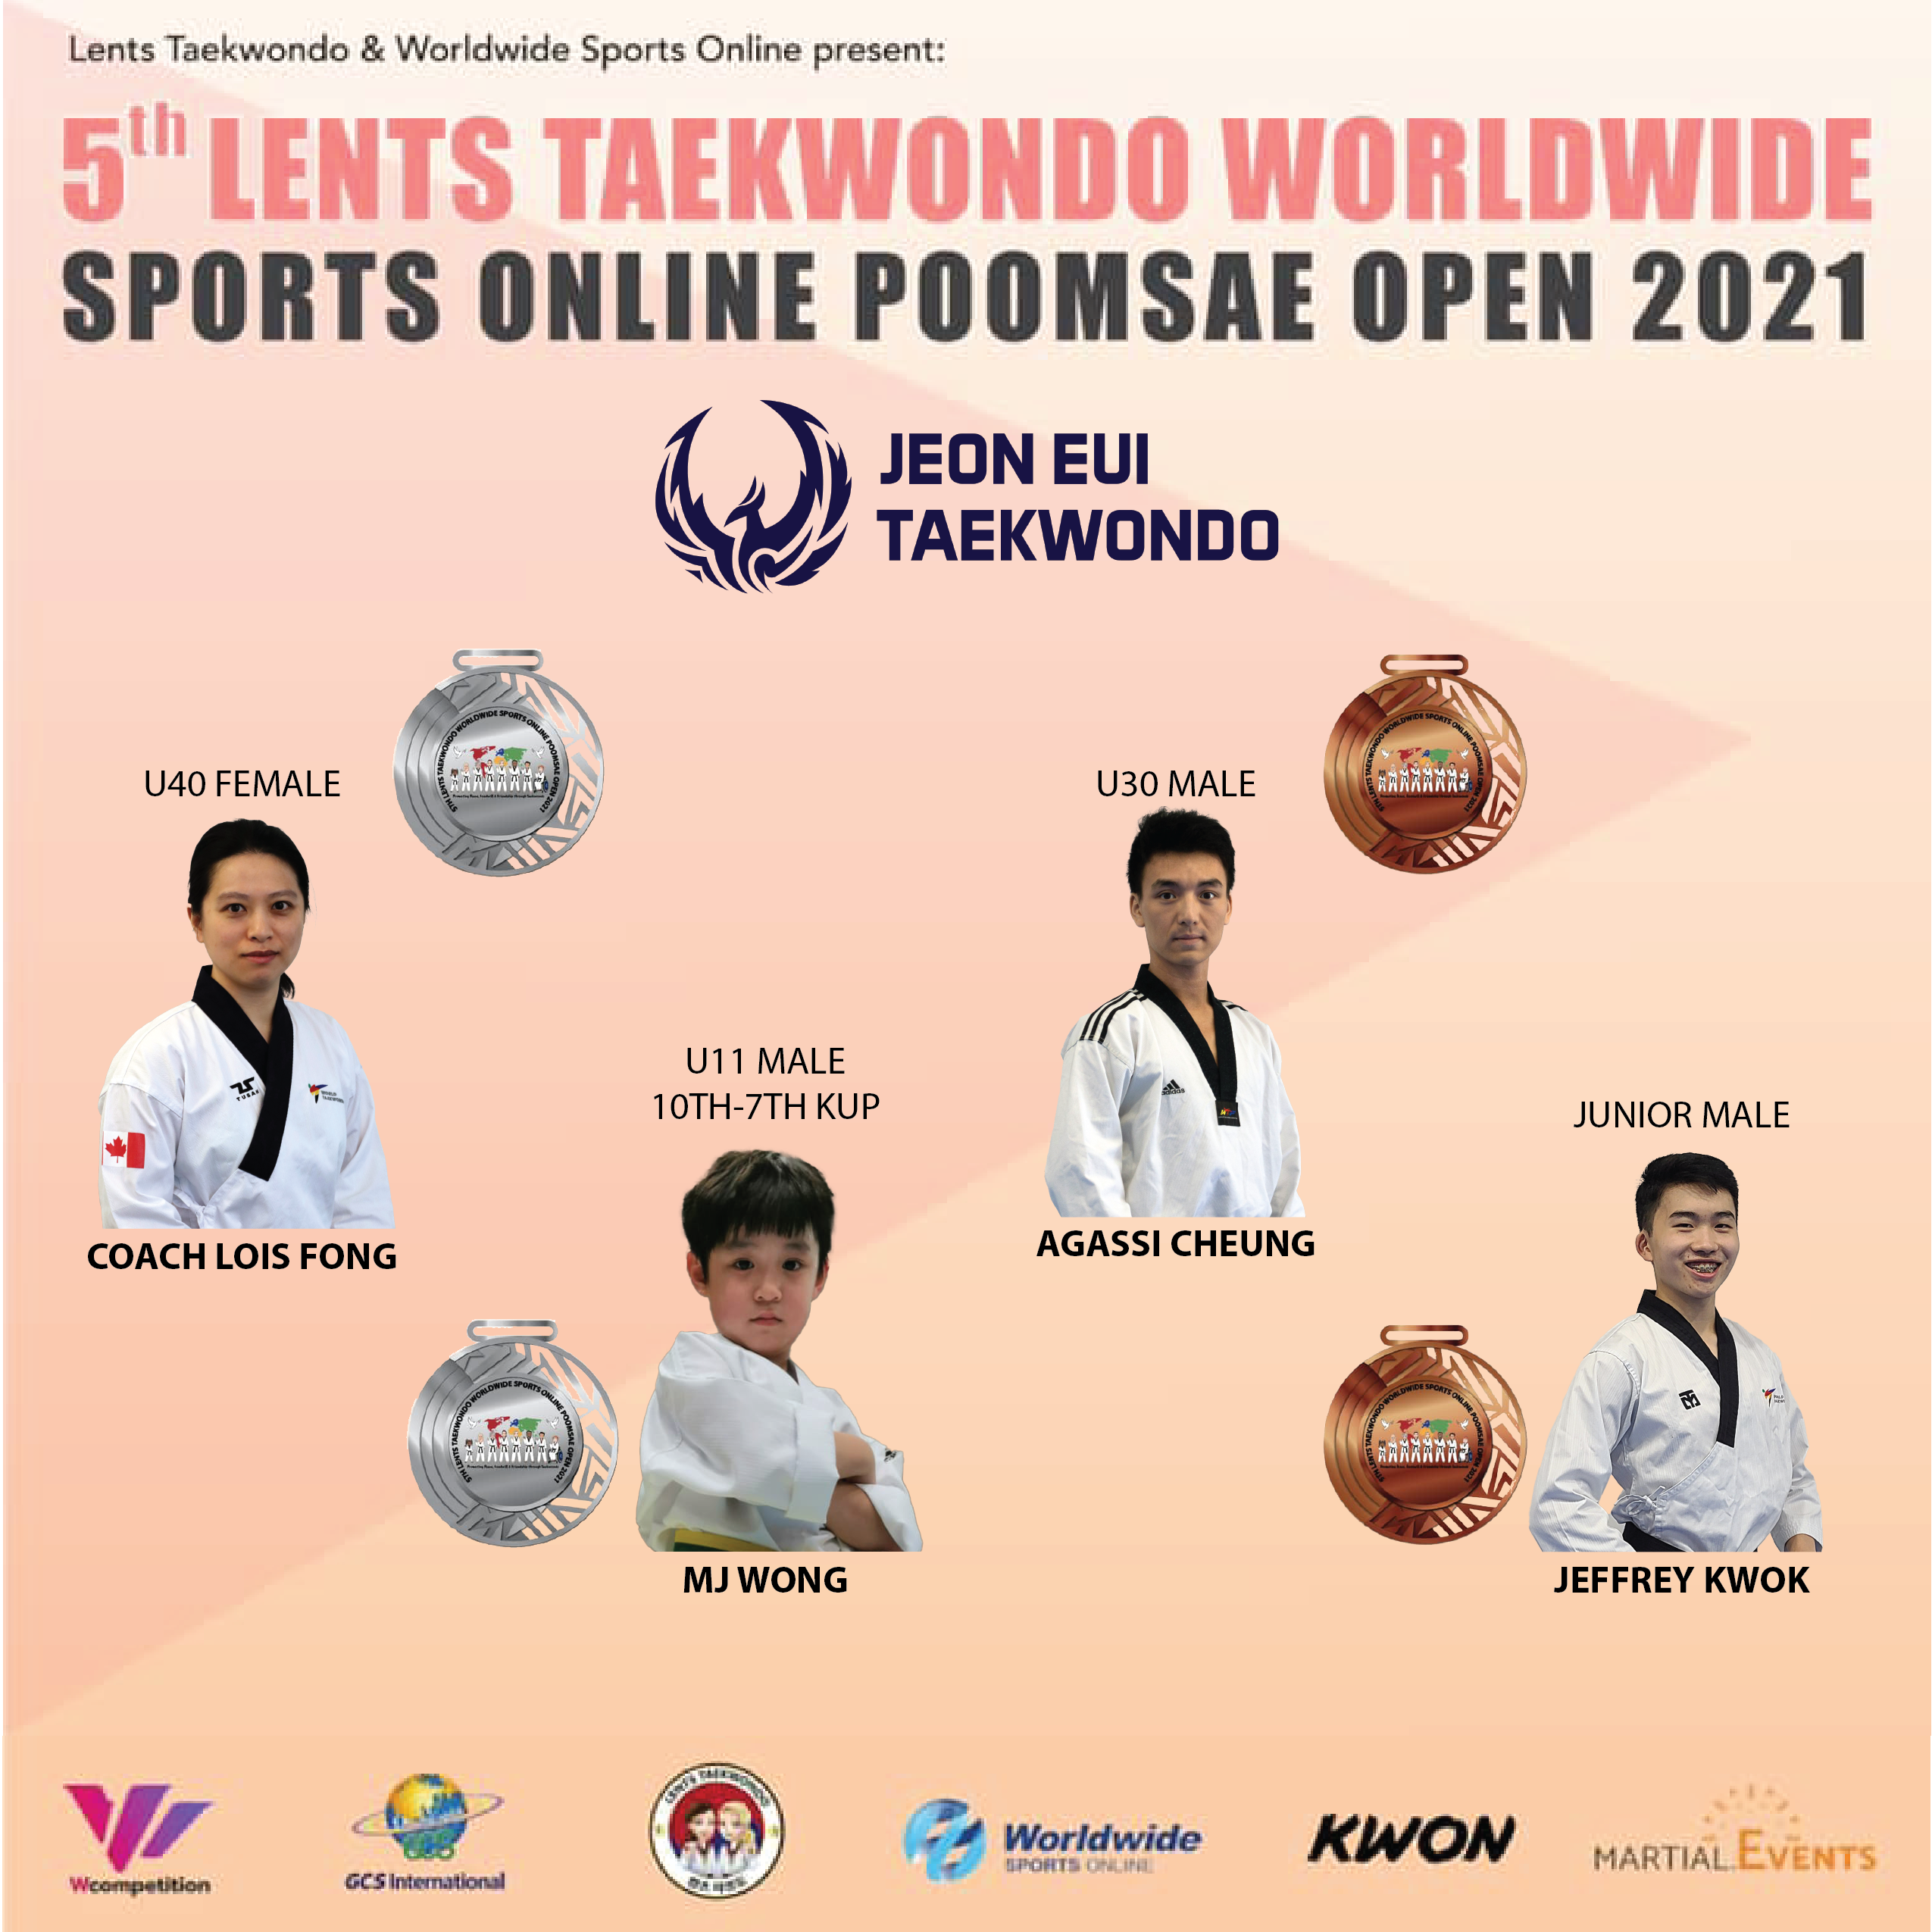 5th Lents Taekwondo Worldwide Sports Online Poomsae Open 2021 (Denmark)